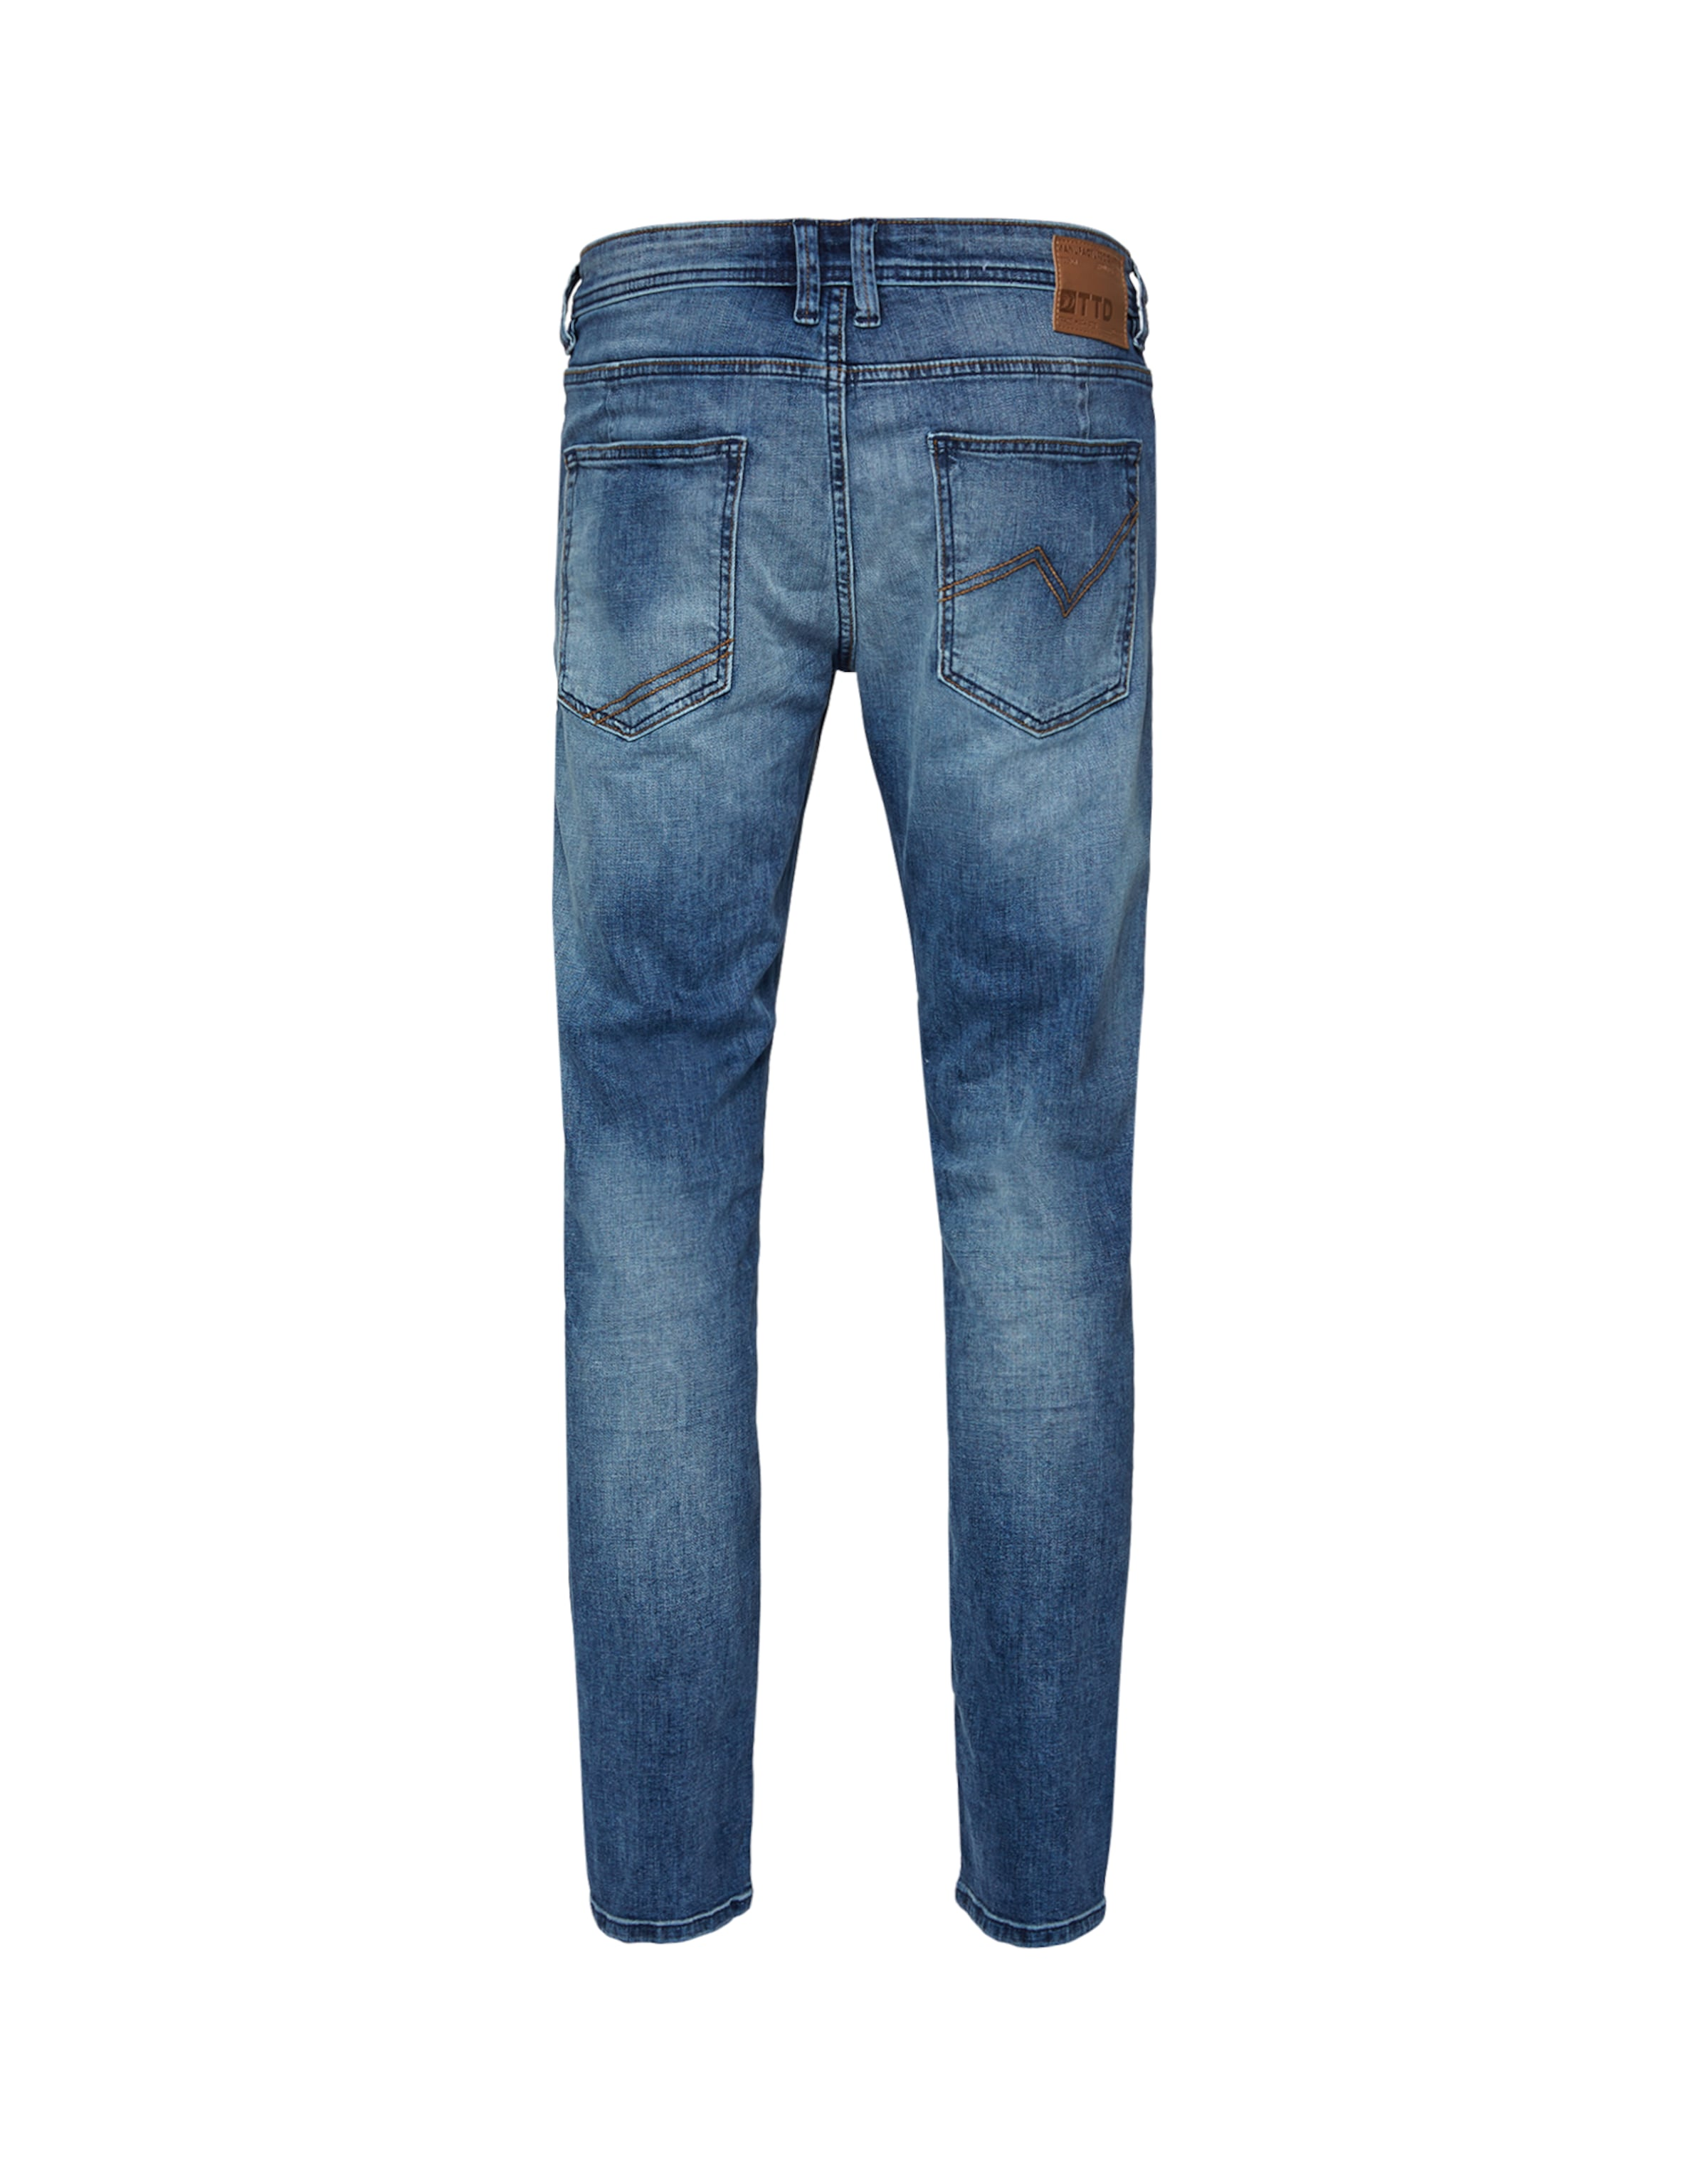 En Jean Denim Tom 'piers' Bleu Tailor QCxedWrBo